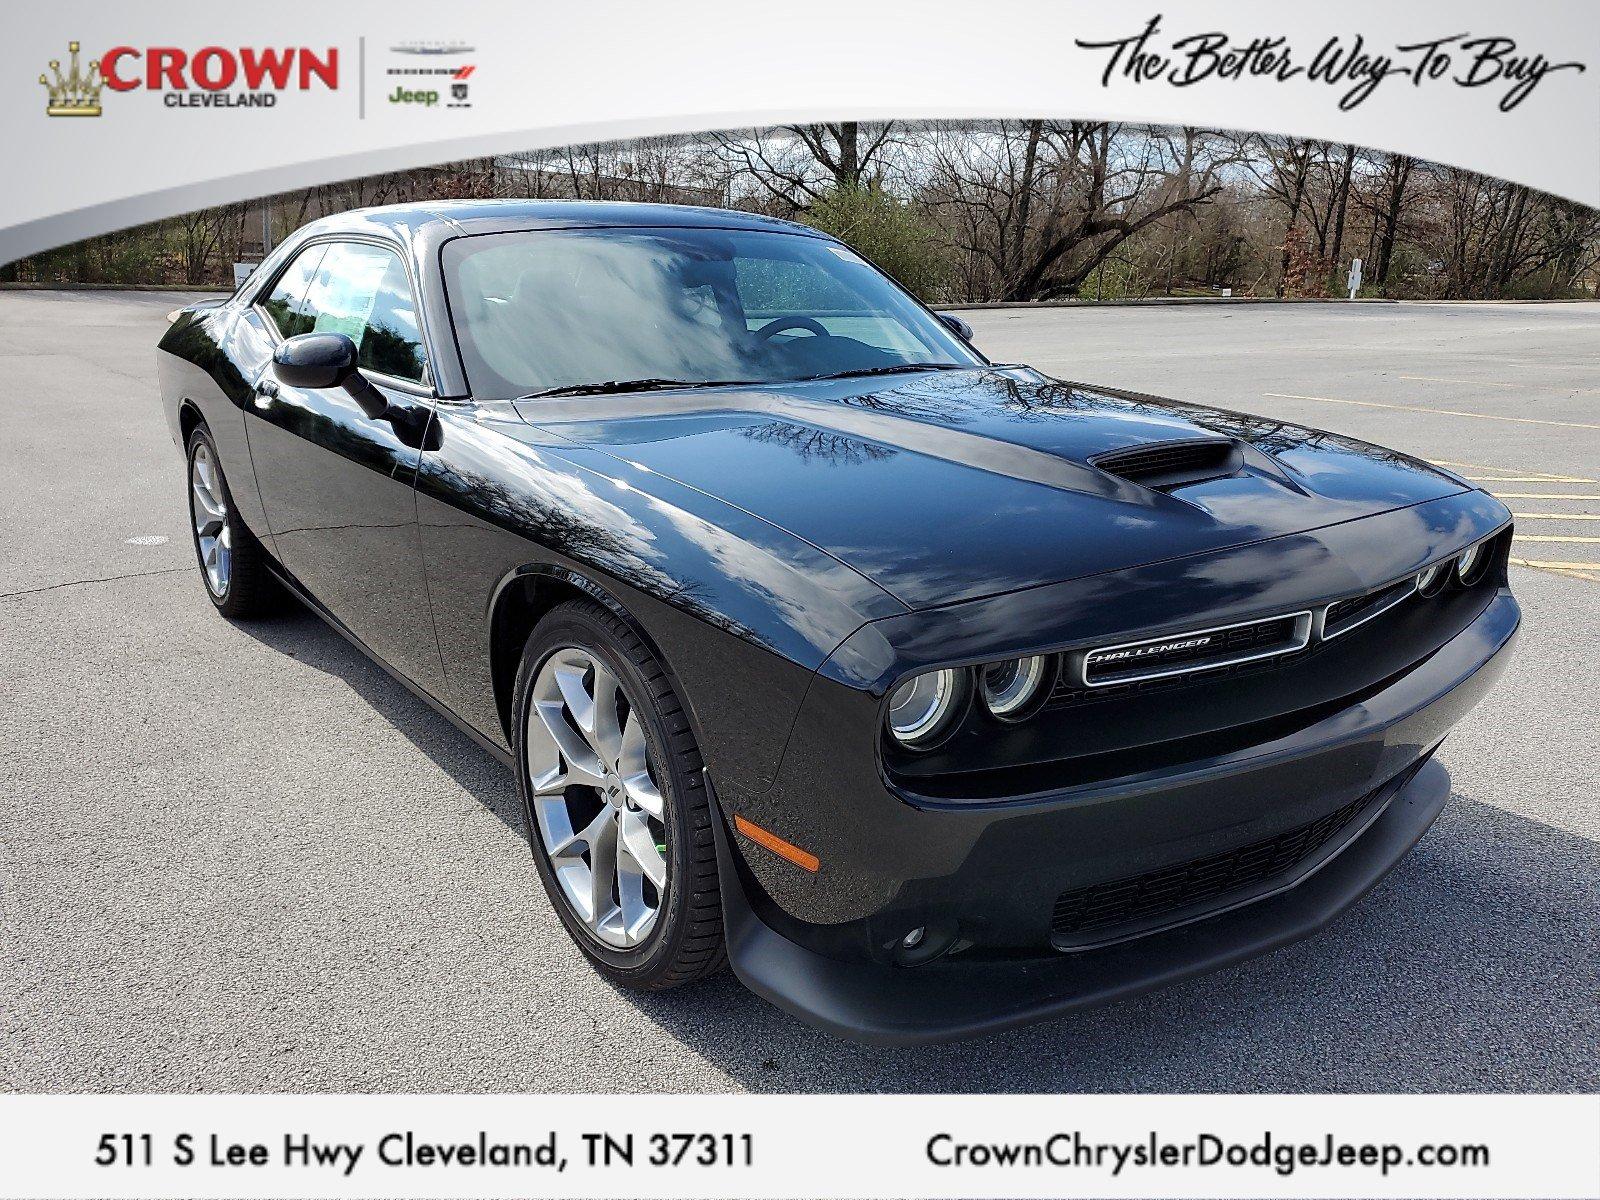 Brand New Chrysler Dodge Jeep Rams Crown Cdjr Cleveland Tn